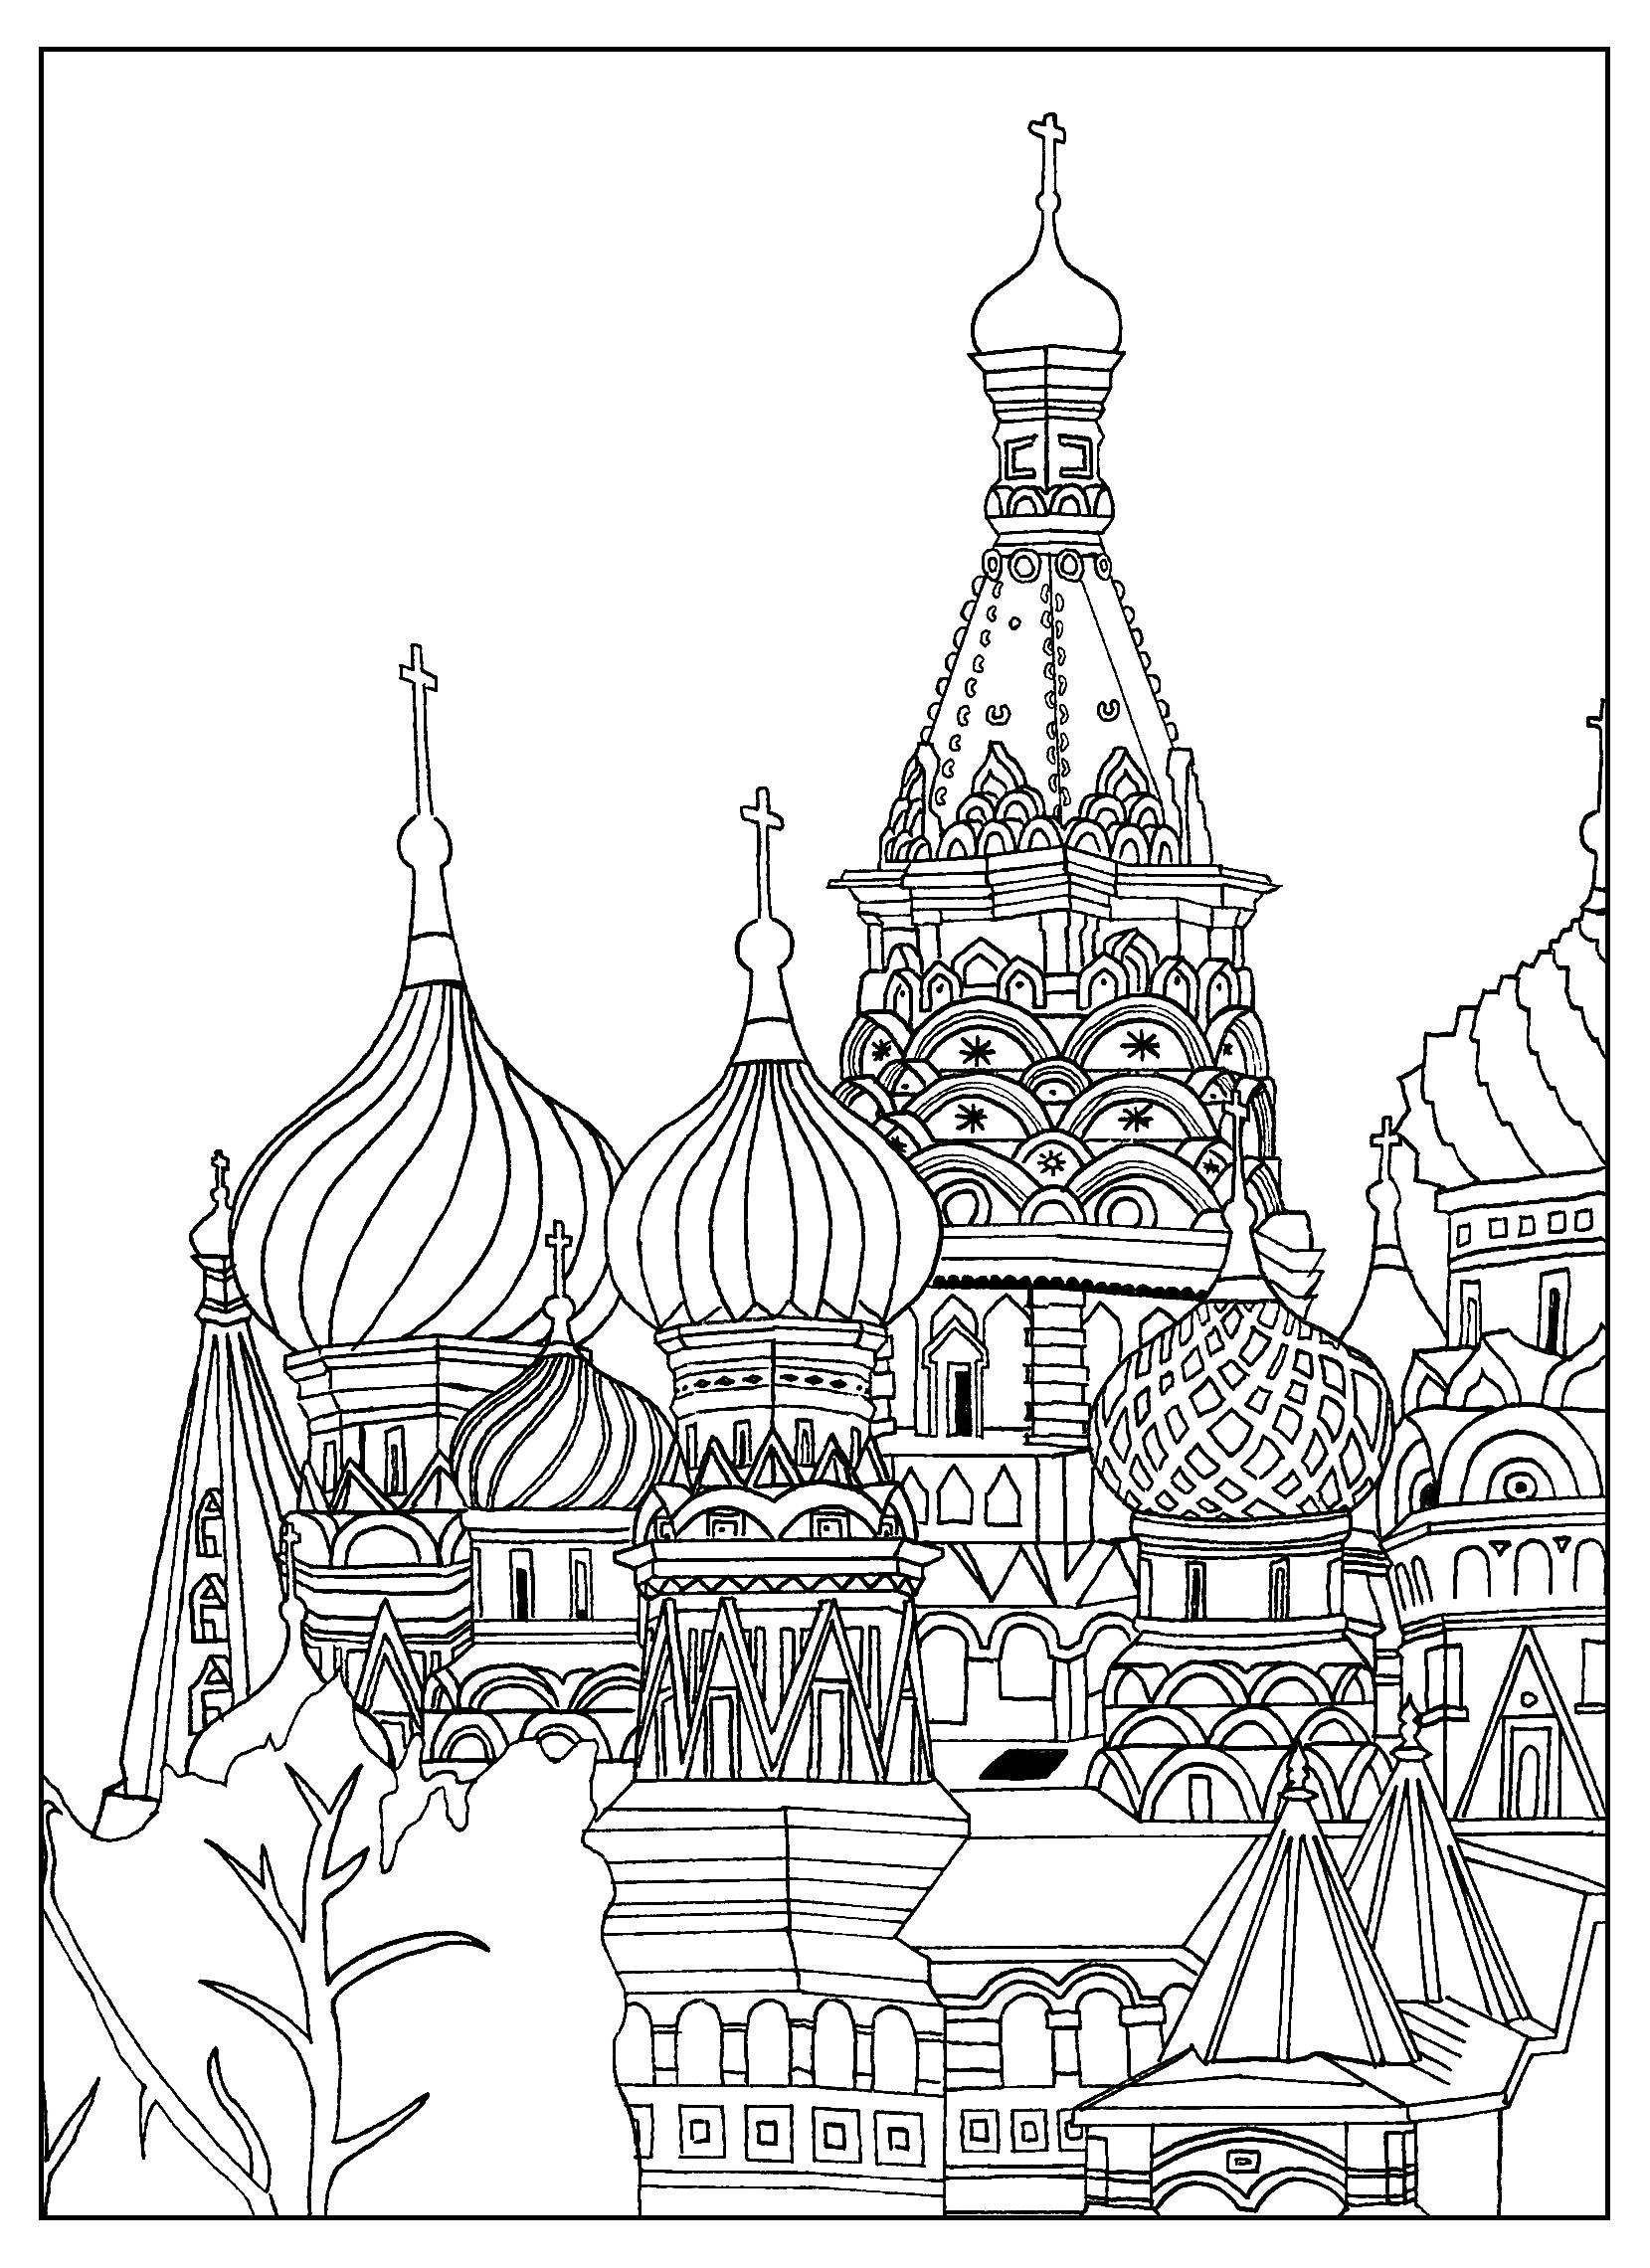 Architecture home 60727 | Sofian - Colorear para adultos | JustColor